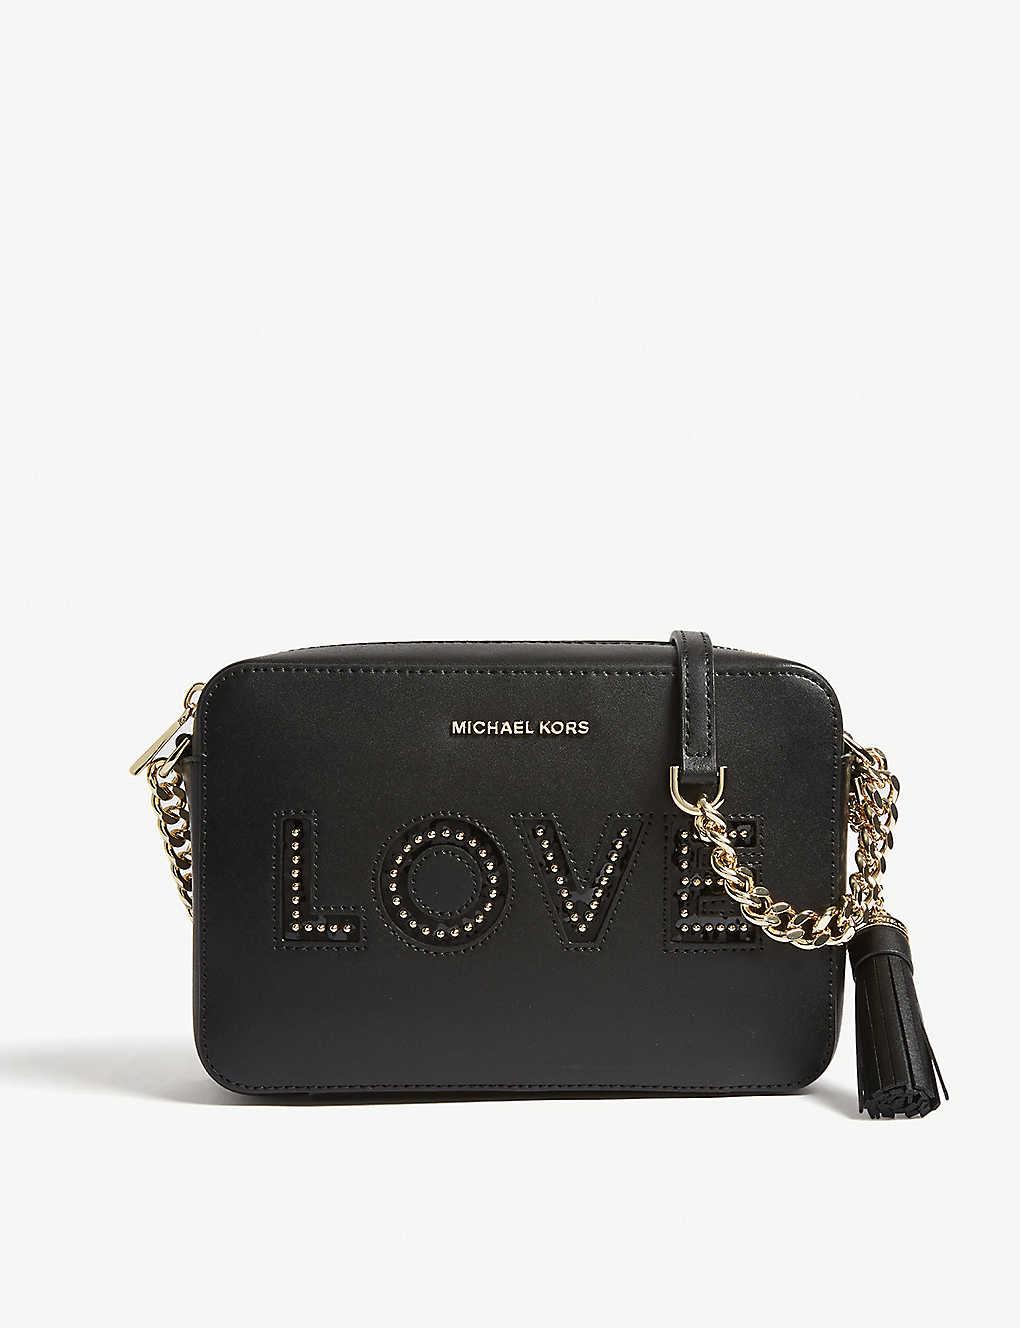 6f8625e3d1d2cb MICHAEL MICHAEL KORS - Ginny love leather camera bag | Selfridges.com